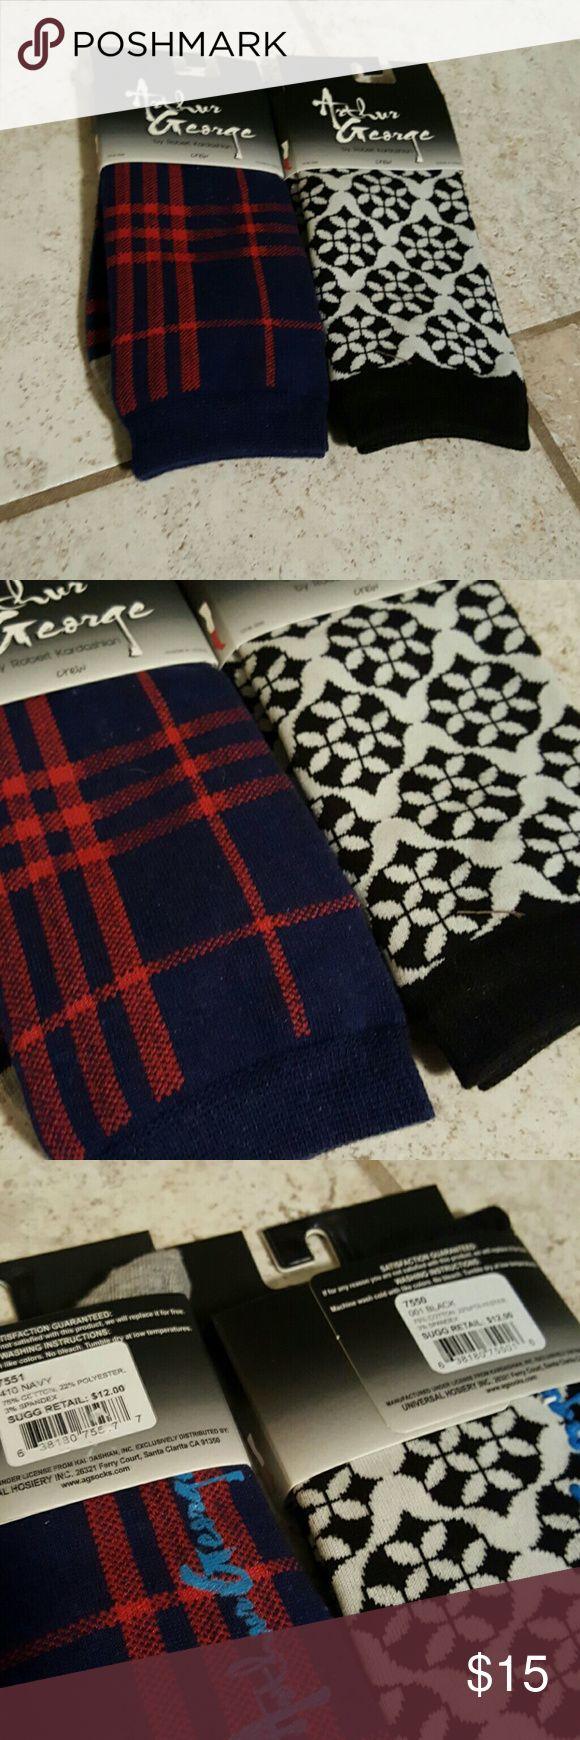 Arthur George sock bundle Set of two pairs of new Arthur George crew socks. One size. 75% cotton 22% polyester 3% spandex. Arthur George  Accessories Hosiery & Socks